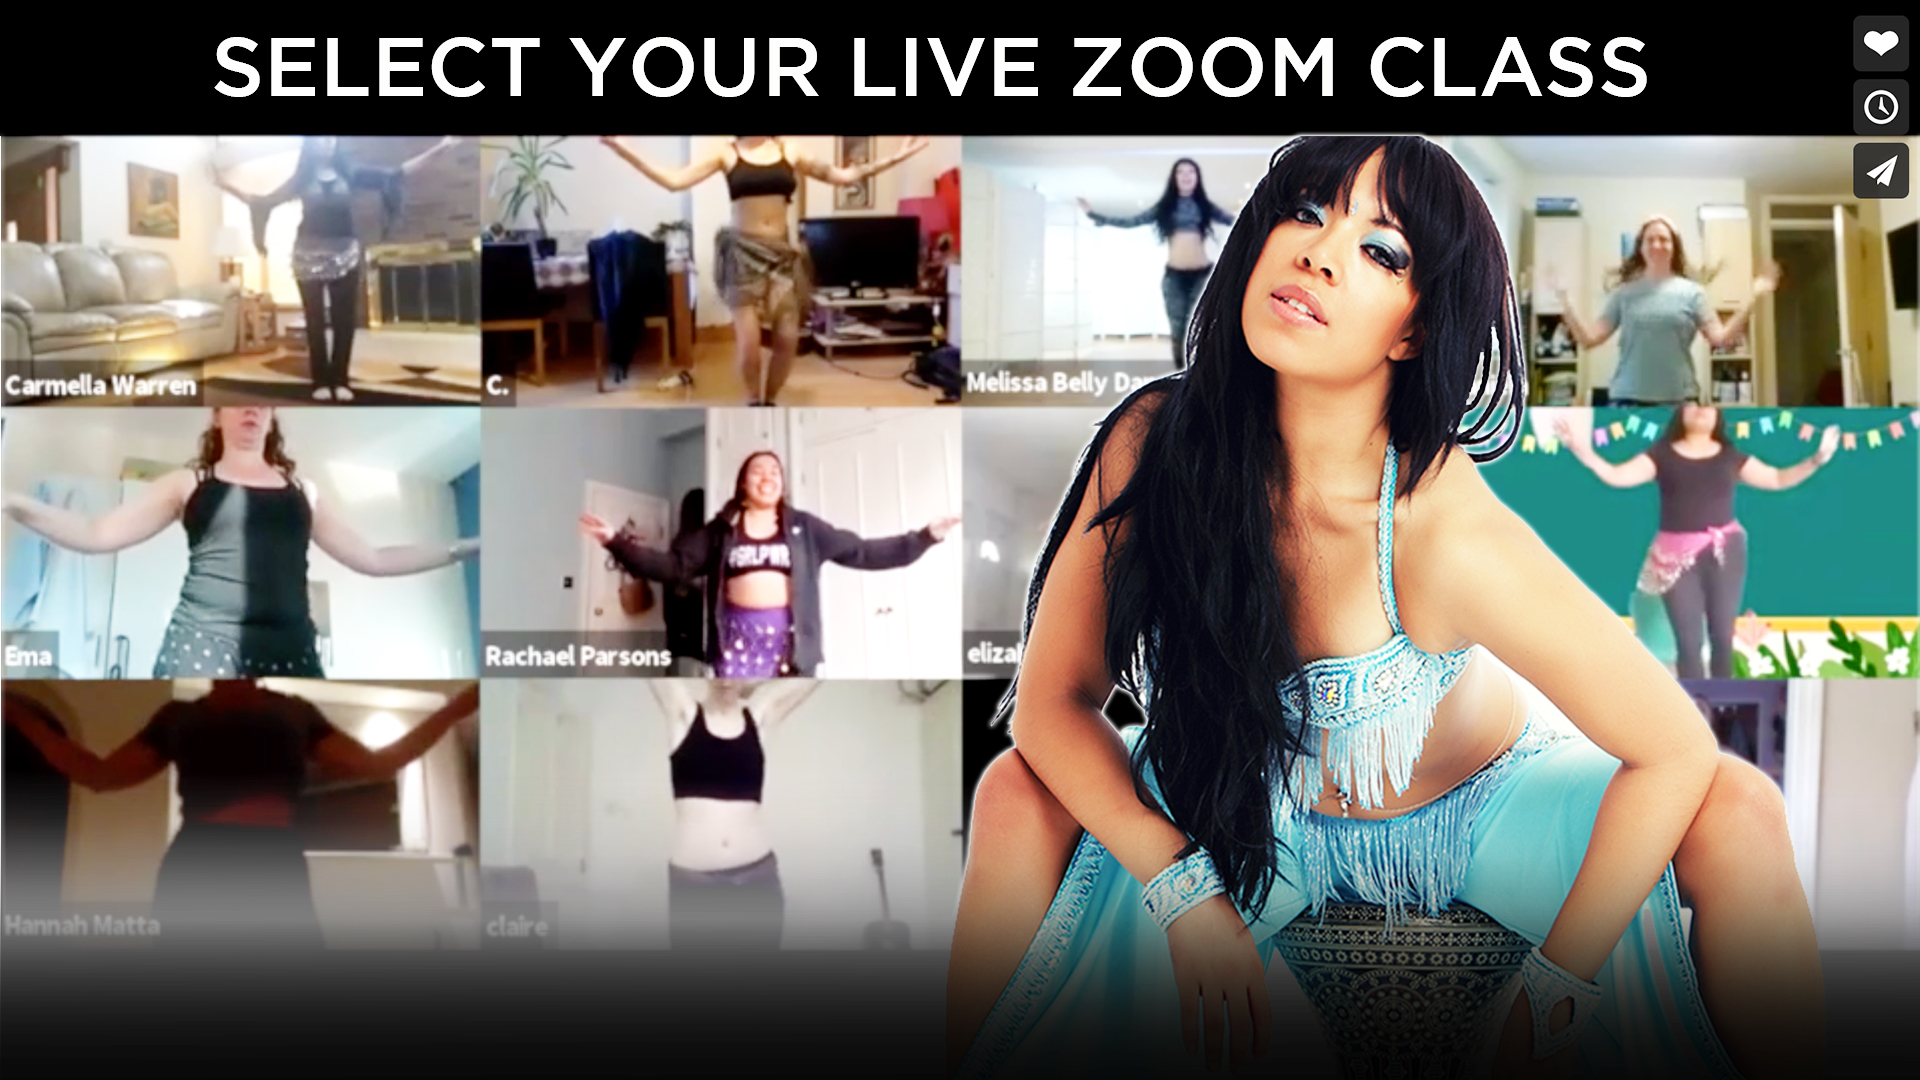 melissa belly dance online zoom classes